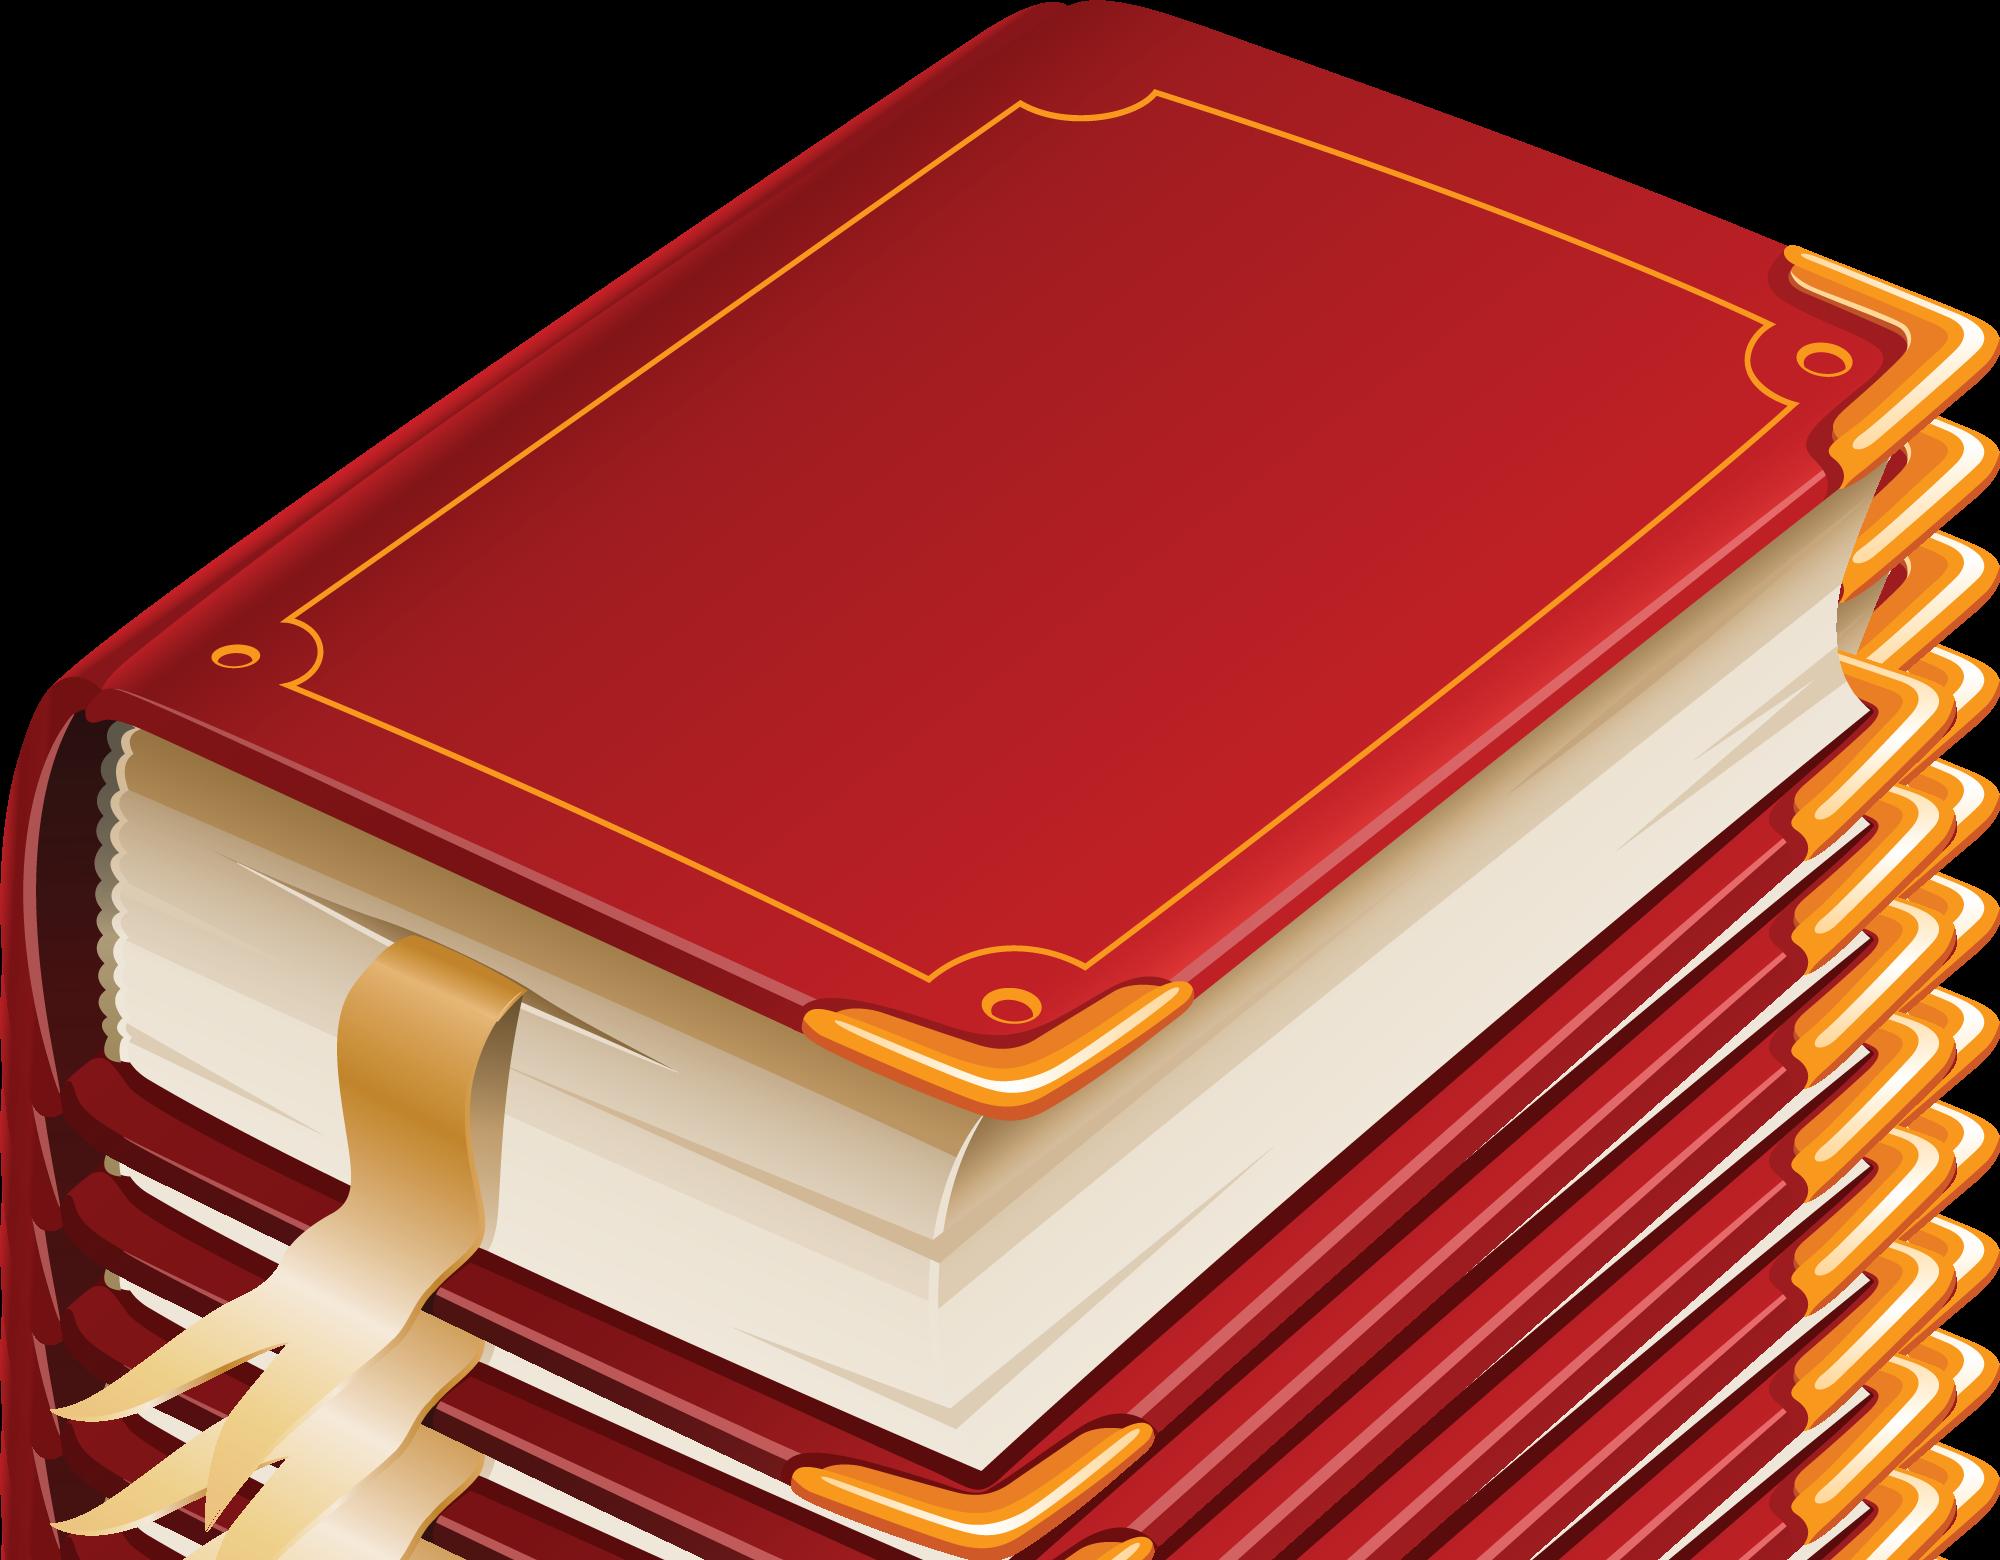 Book HD wallpapers, Desktop wallpaper - most viewed